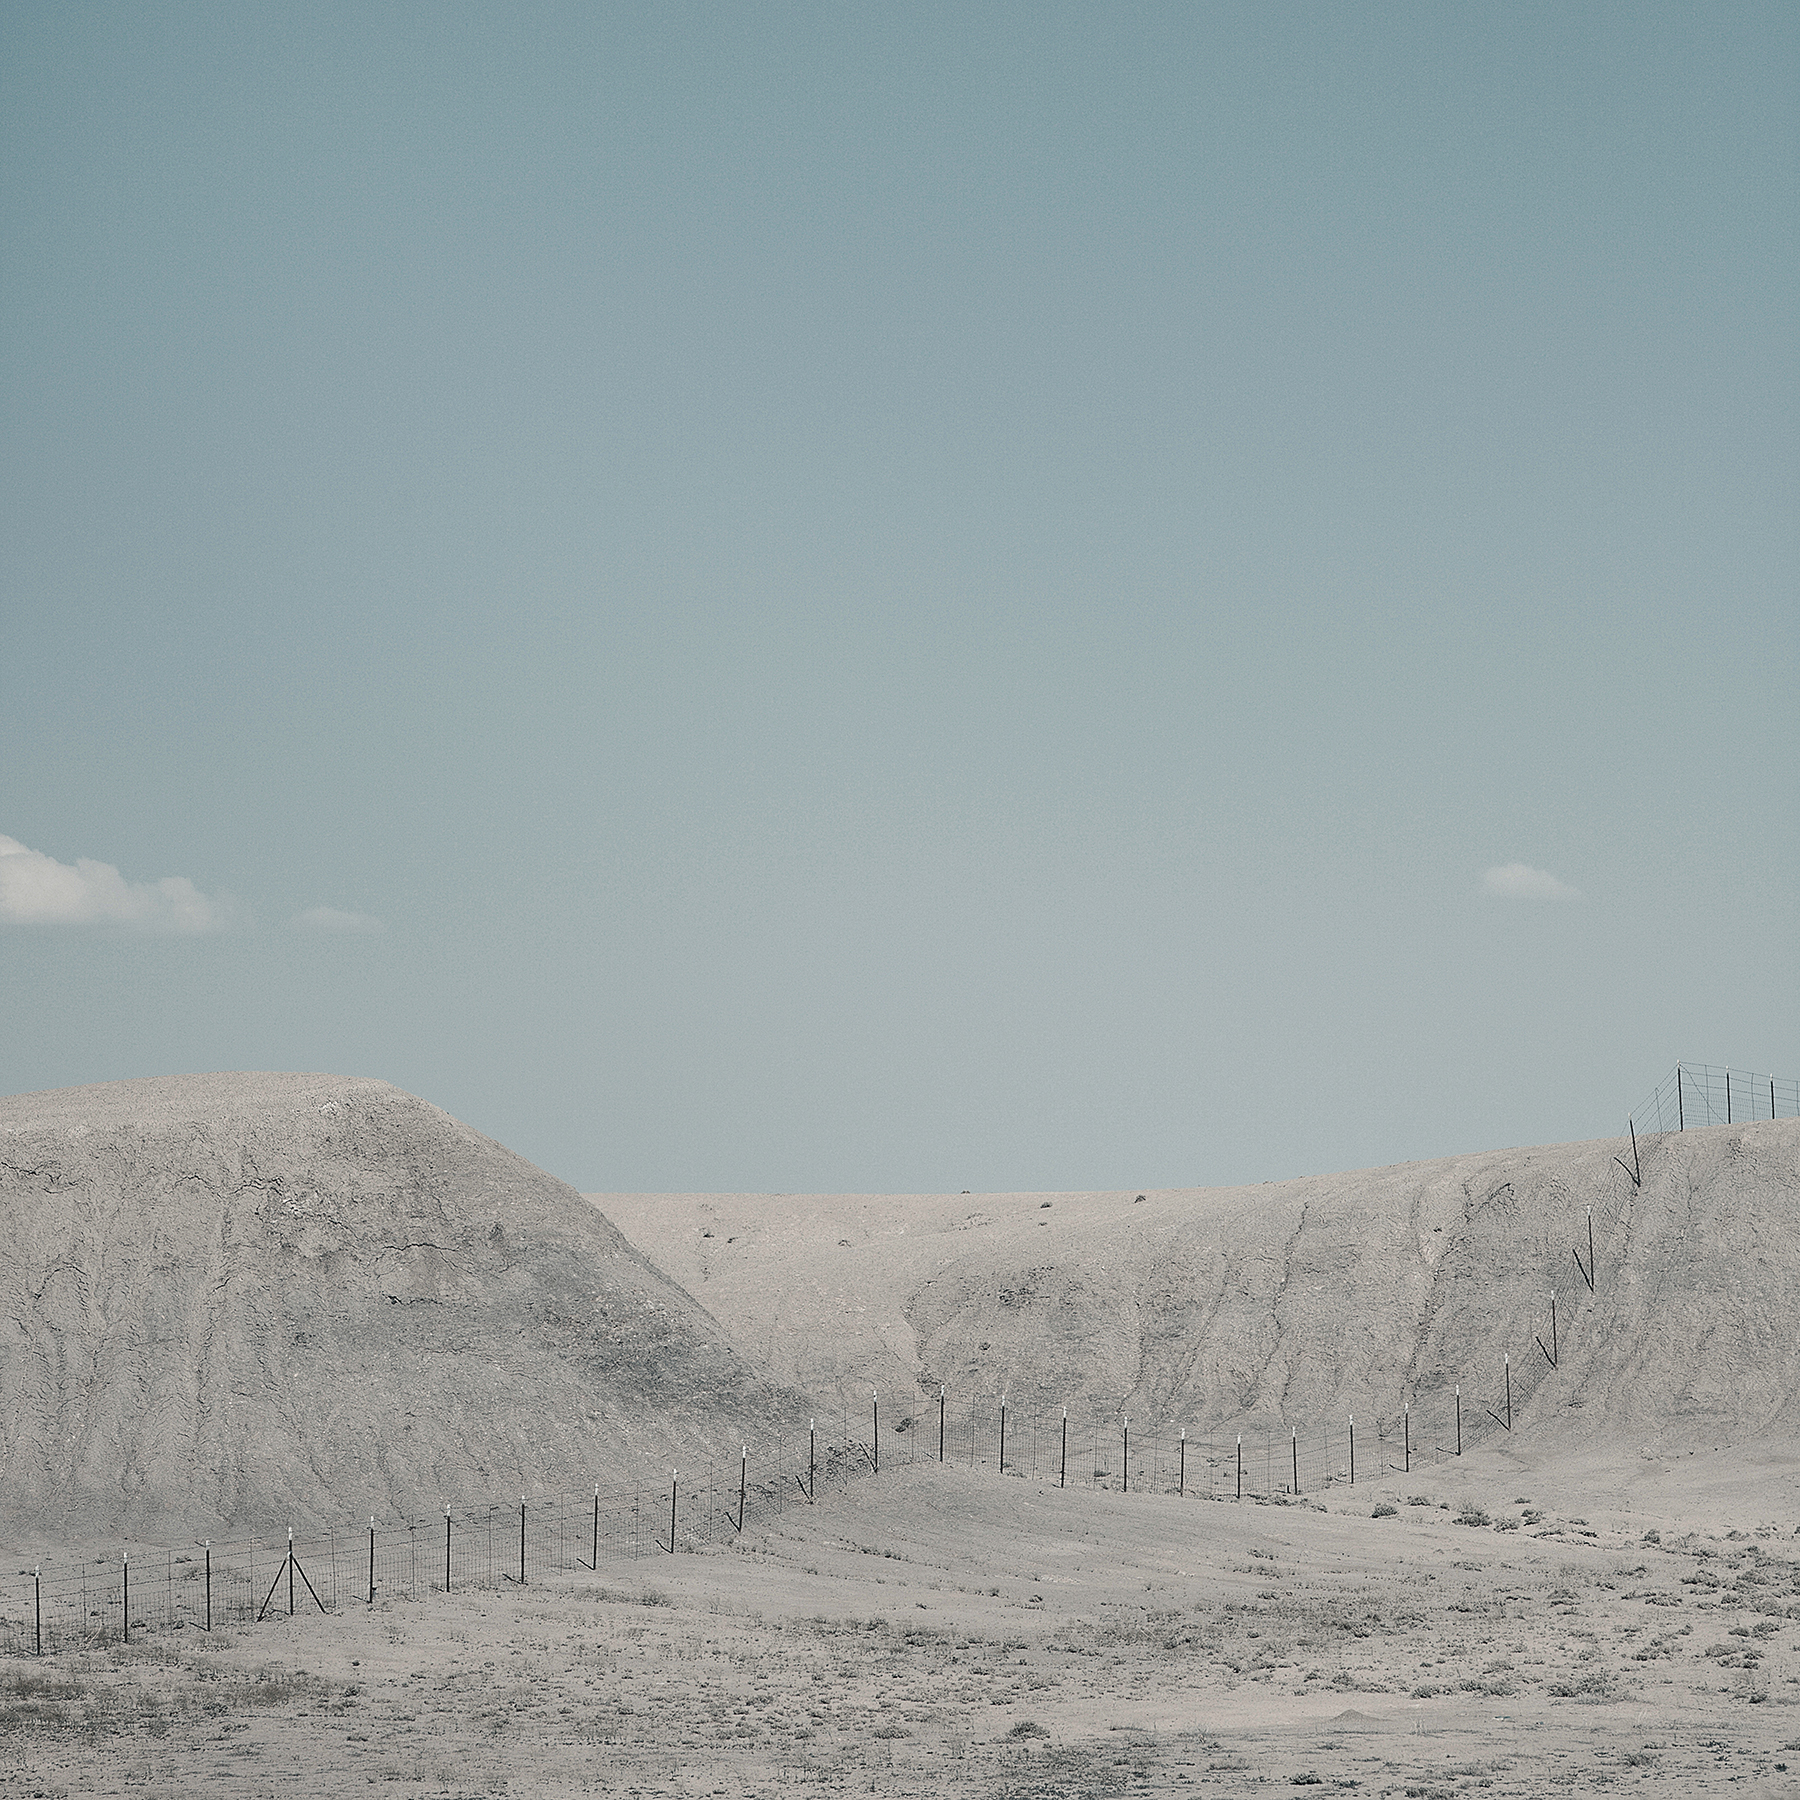 © duston todd_fine art_desert_landscape_fence_minimalism.jpg